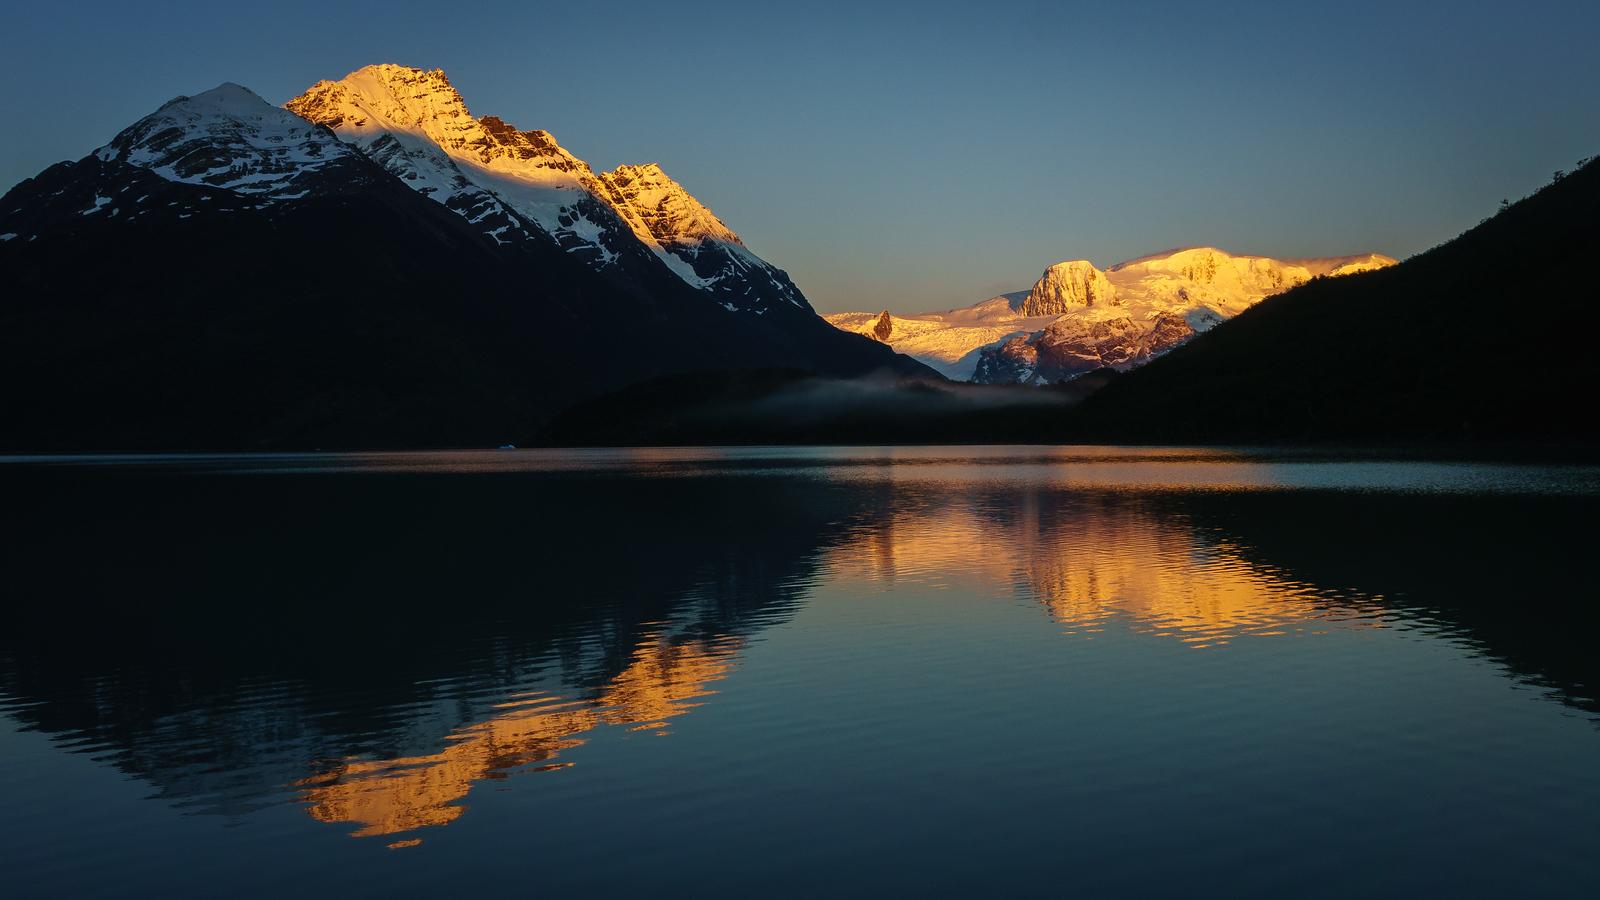 Sonnenaufgang am Dickson-See. Einfach irre!